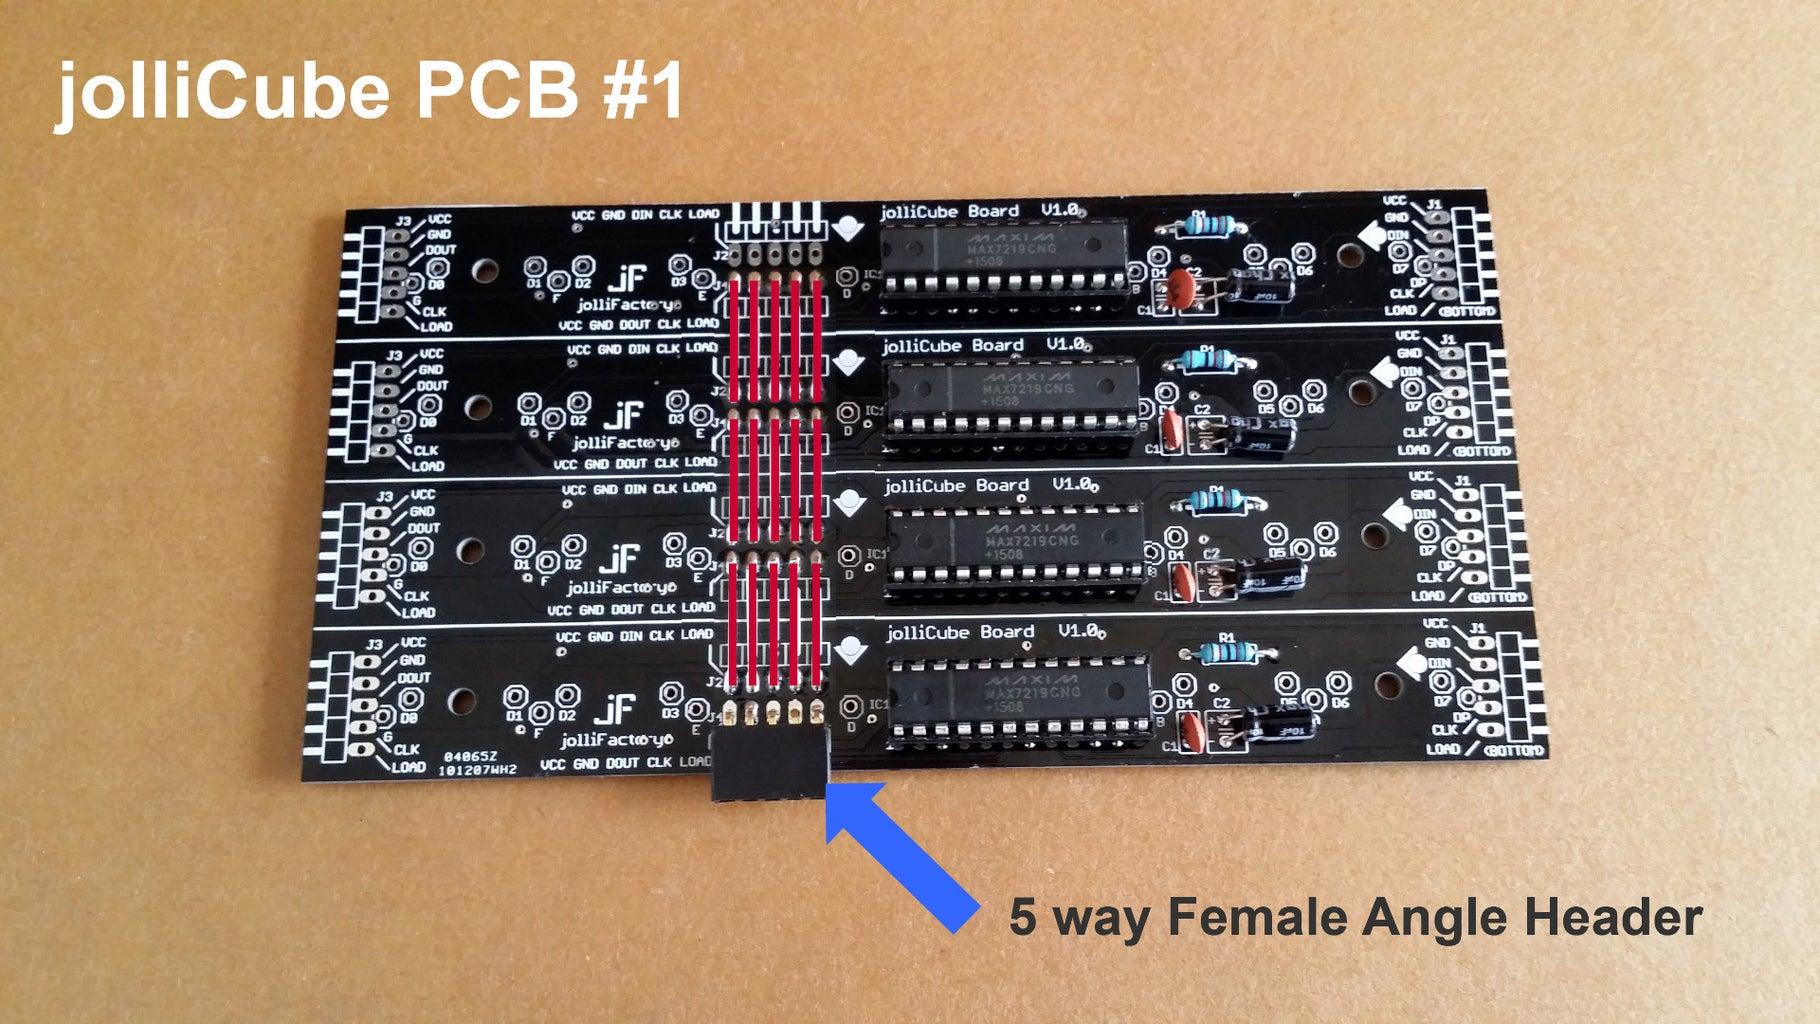 Design of JolliCube - Electronic Control Circuit